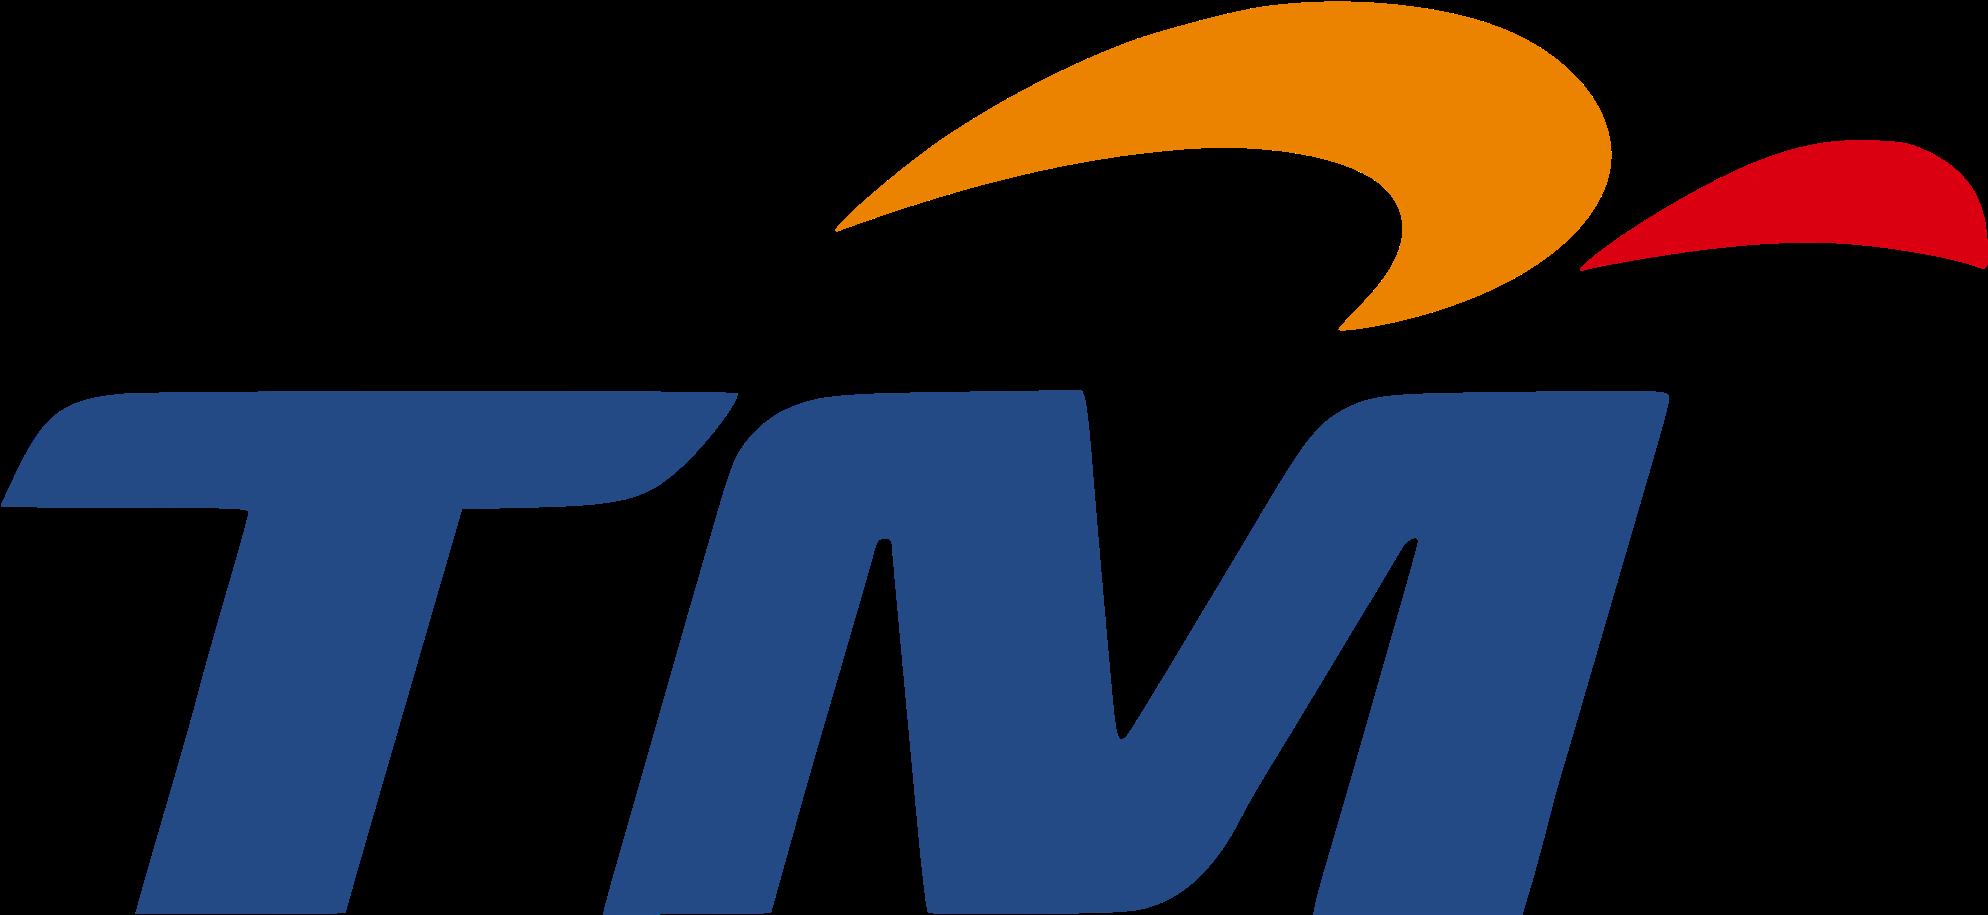 Telekom Malaysia Berhad Logo Clipart.